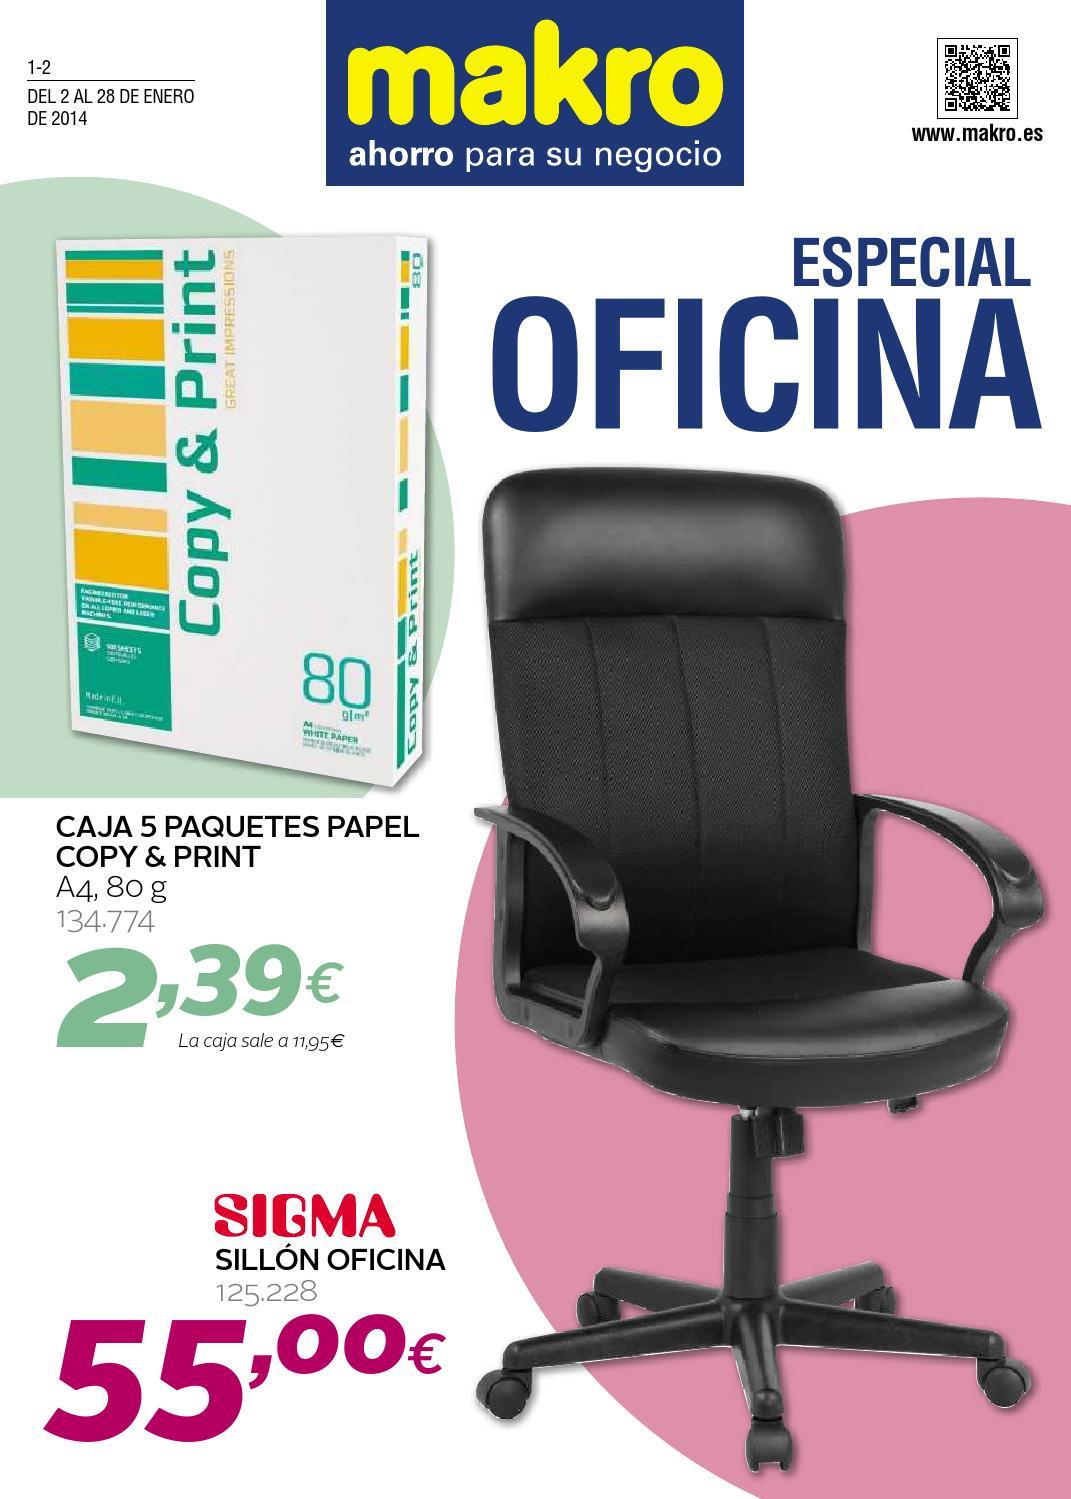 Makro espana ofertas oficina canarias by losdescuentos issuu for Oficinas makro madrid